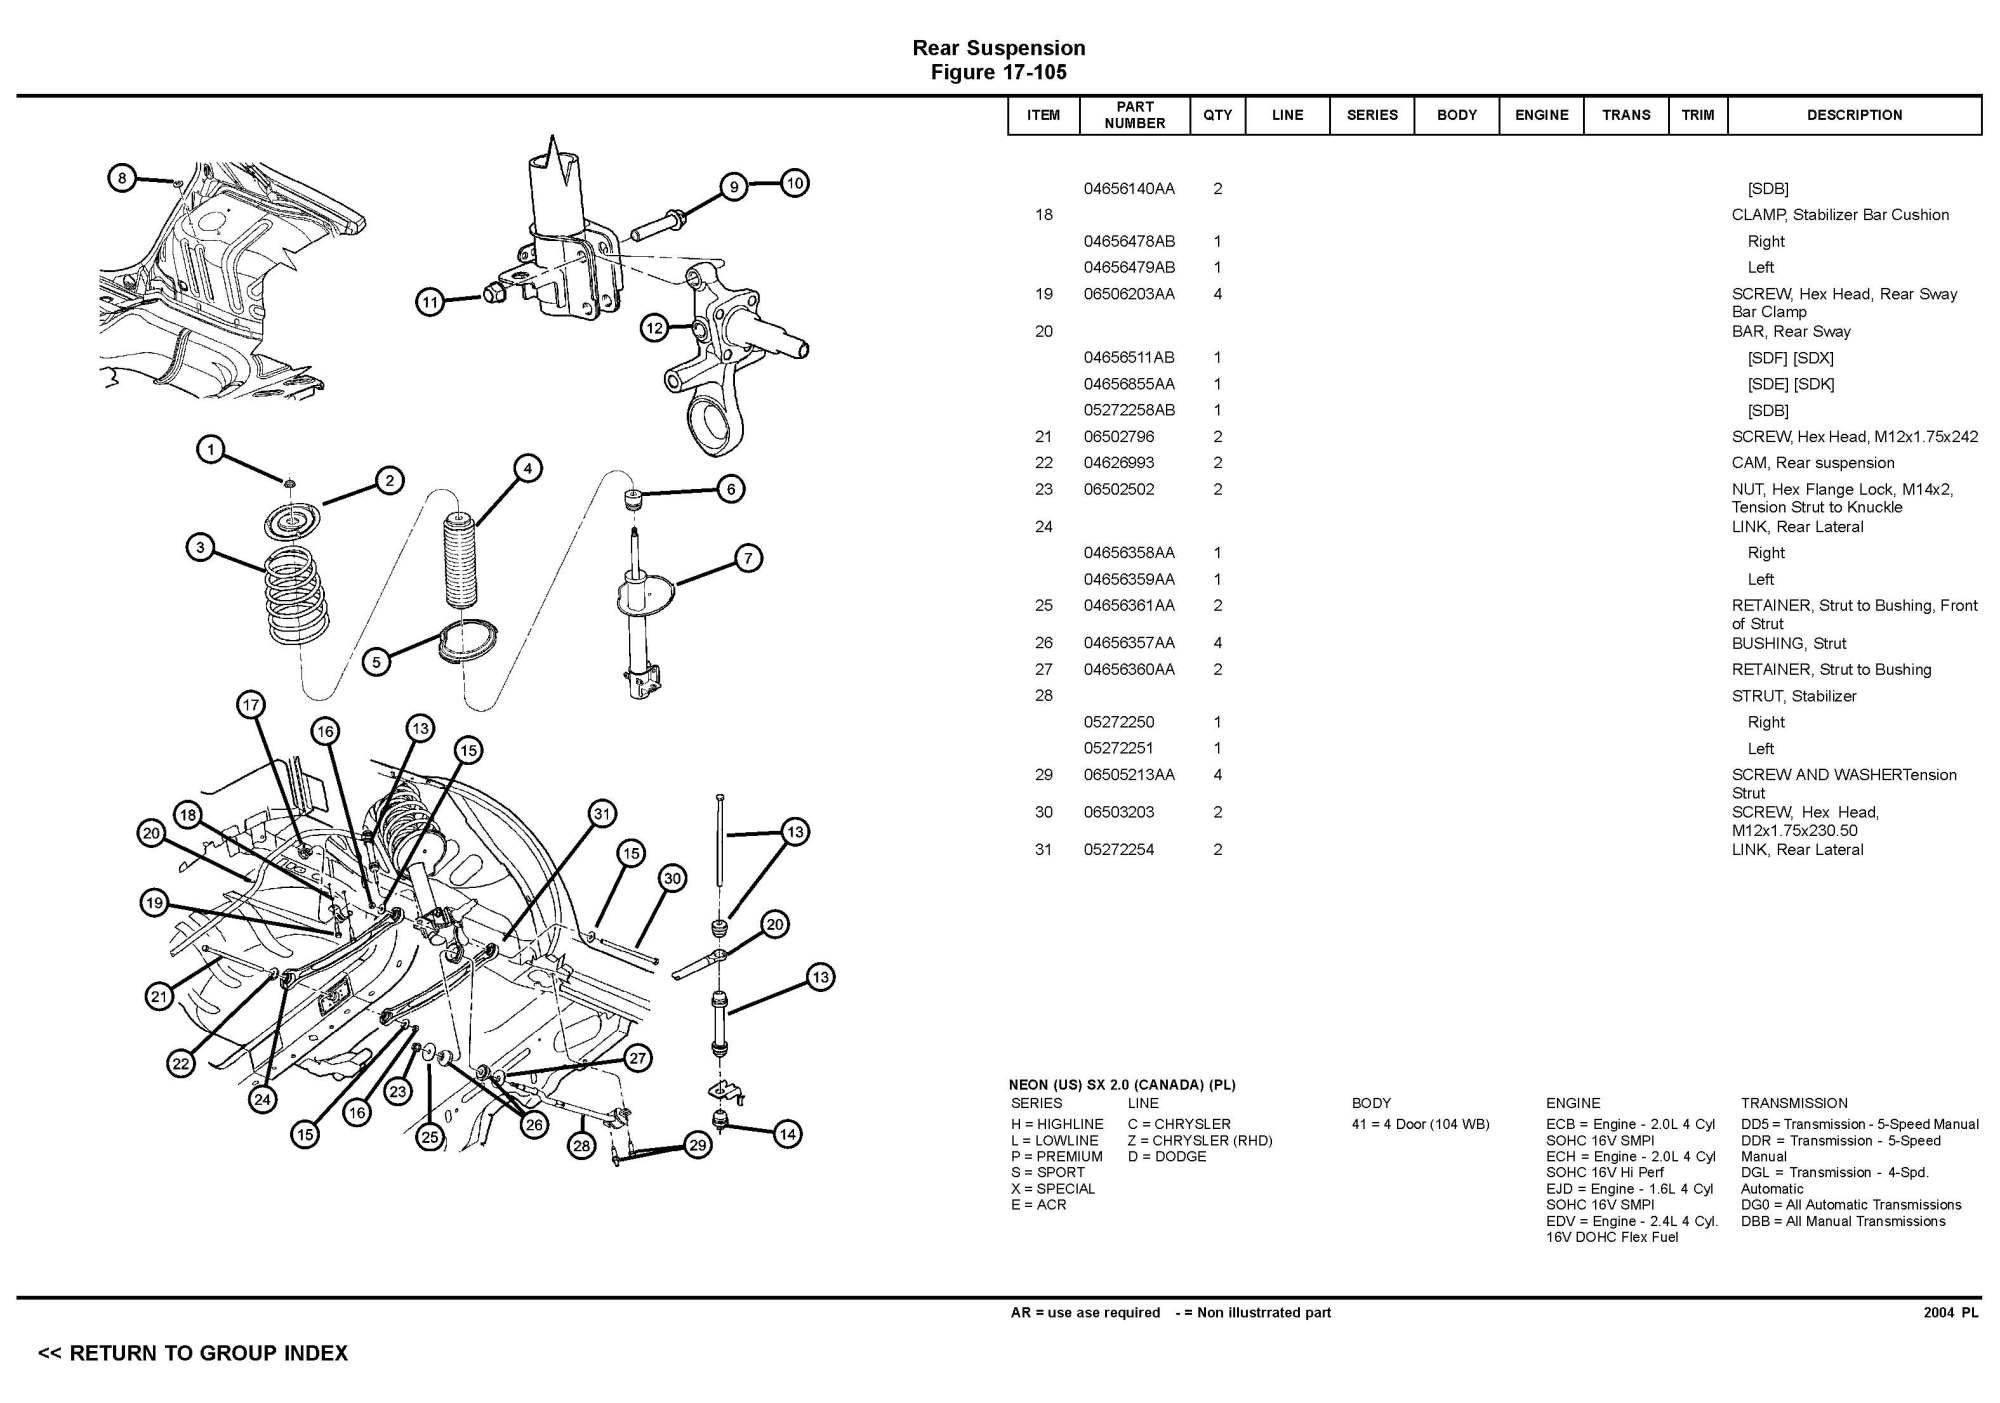 hight resolution of srt 4 suspension faq dodge srt forum dodge durango front suspension diagram dodge neon rear suspension diagram